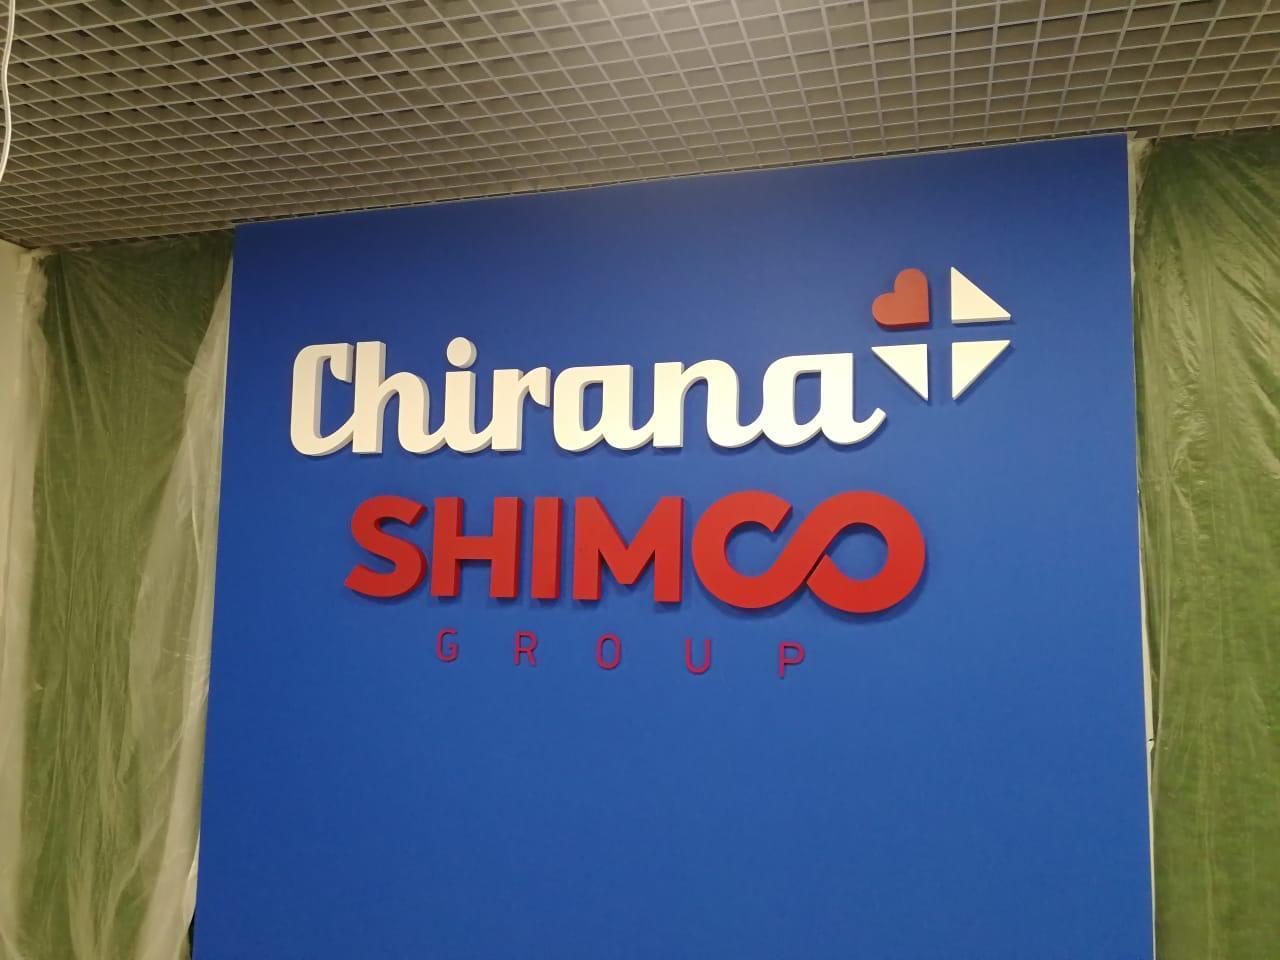 Вывески SHIMCO и Chirana